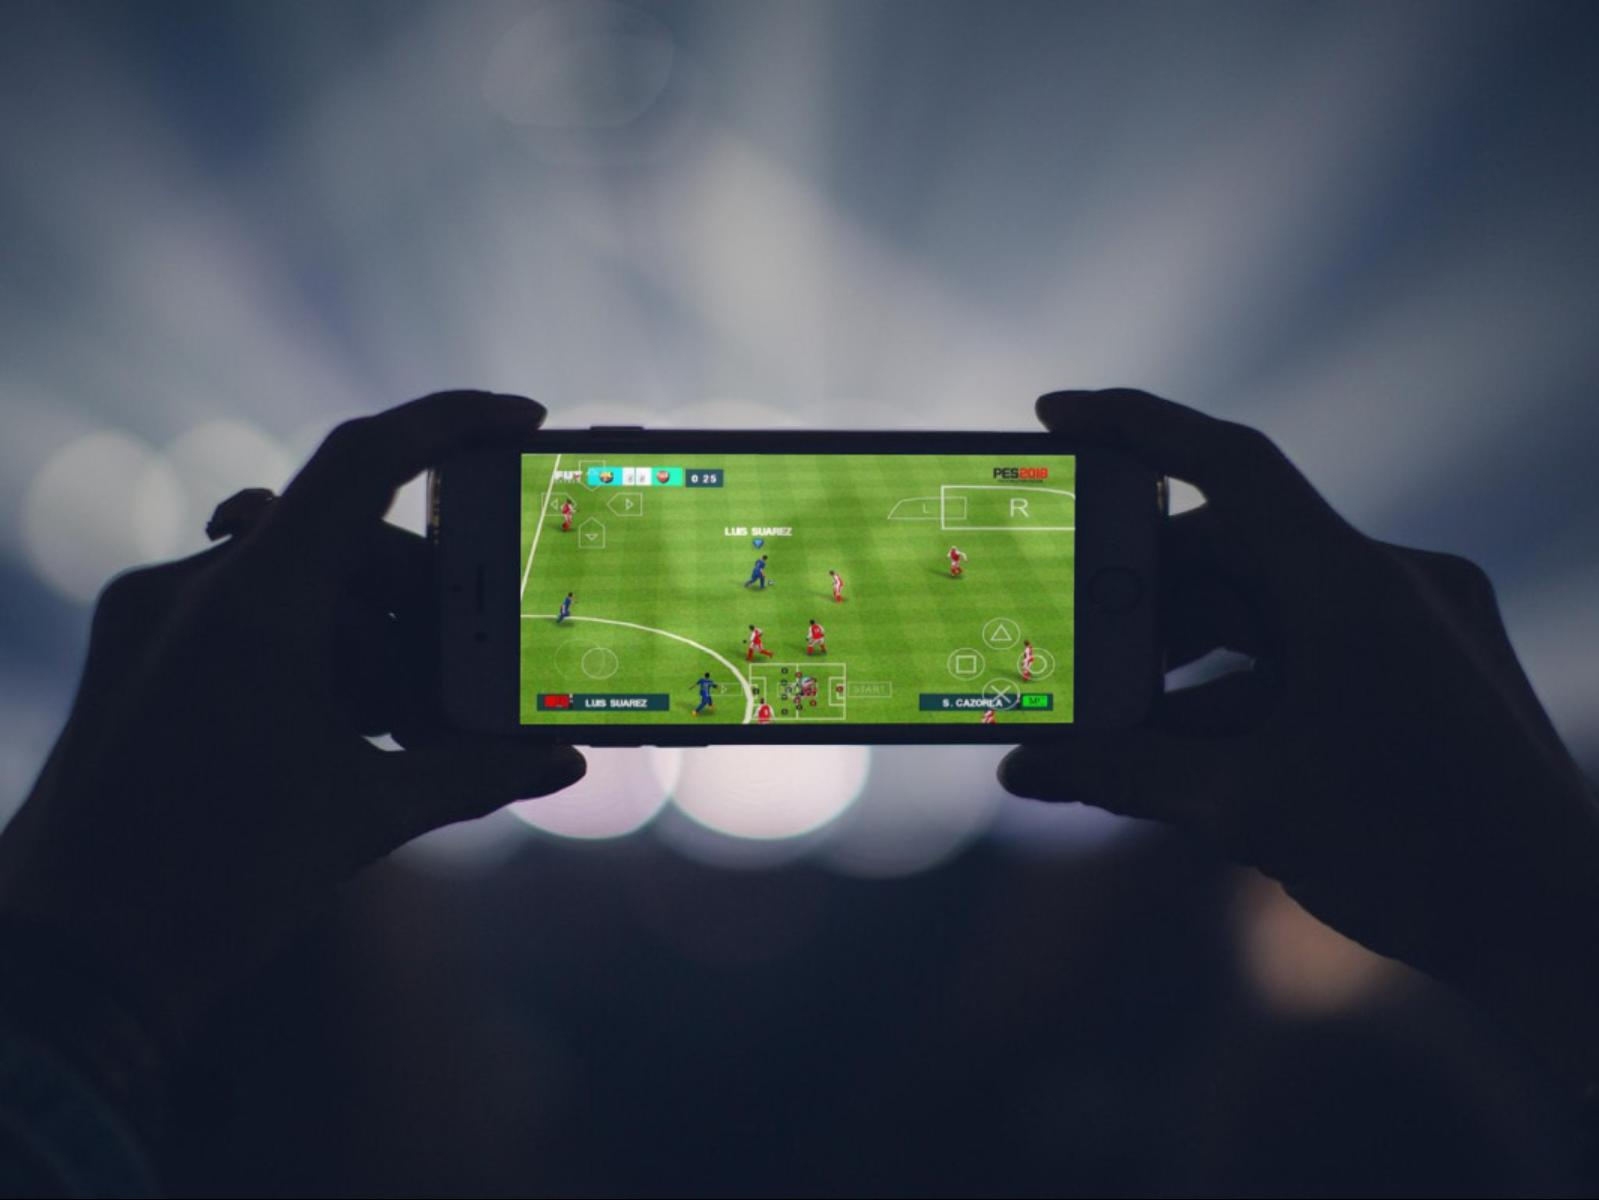 PSP GAME DOWNLOAD: Emulator and ISO screenshot 1